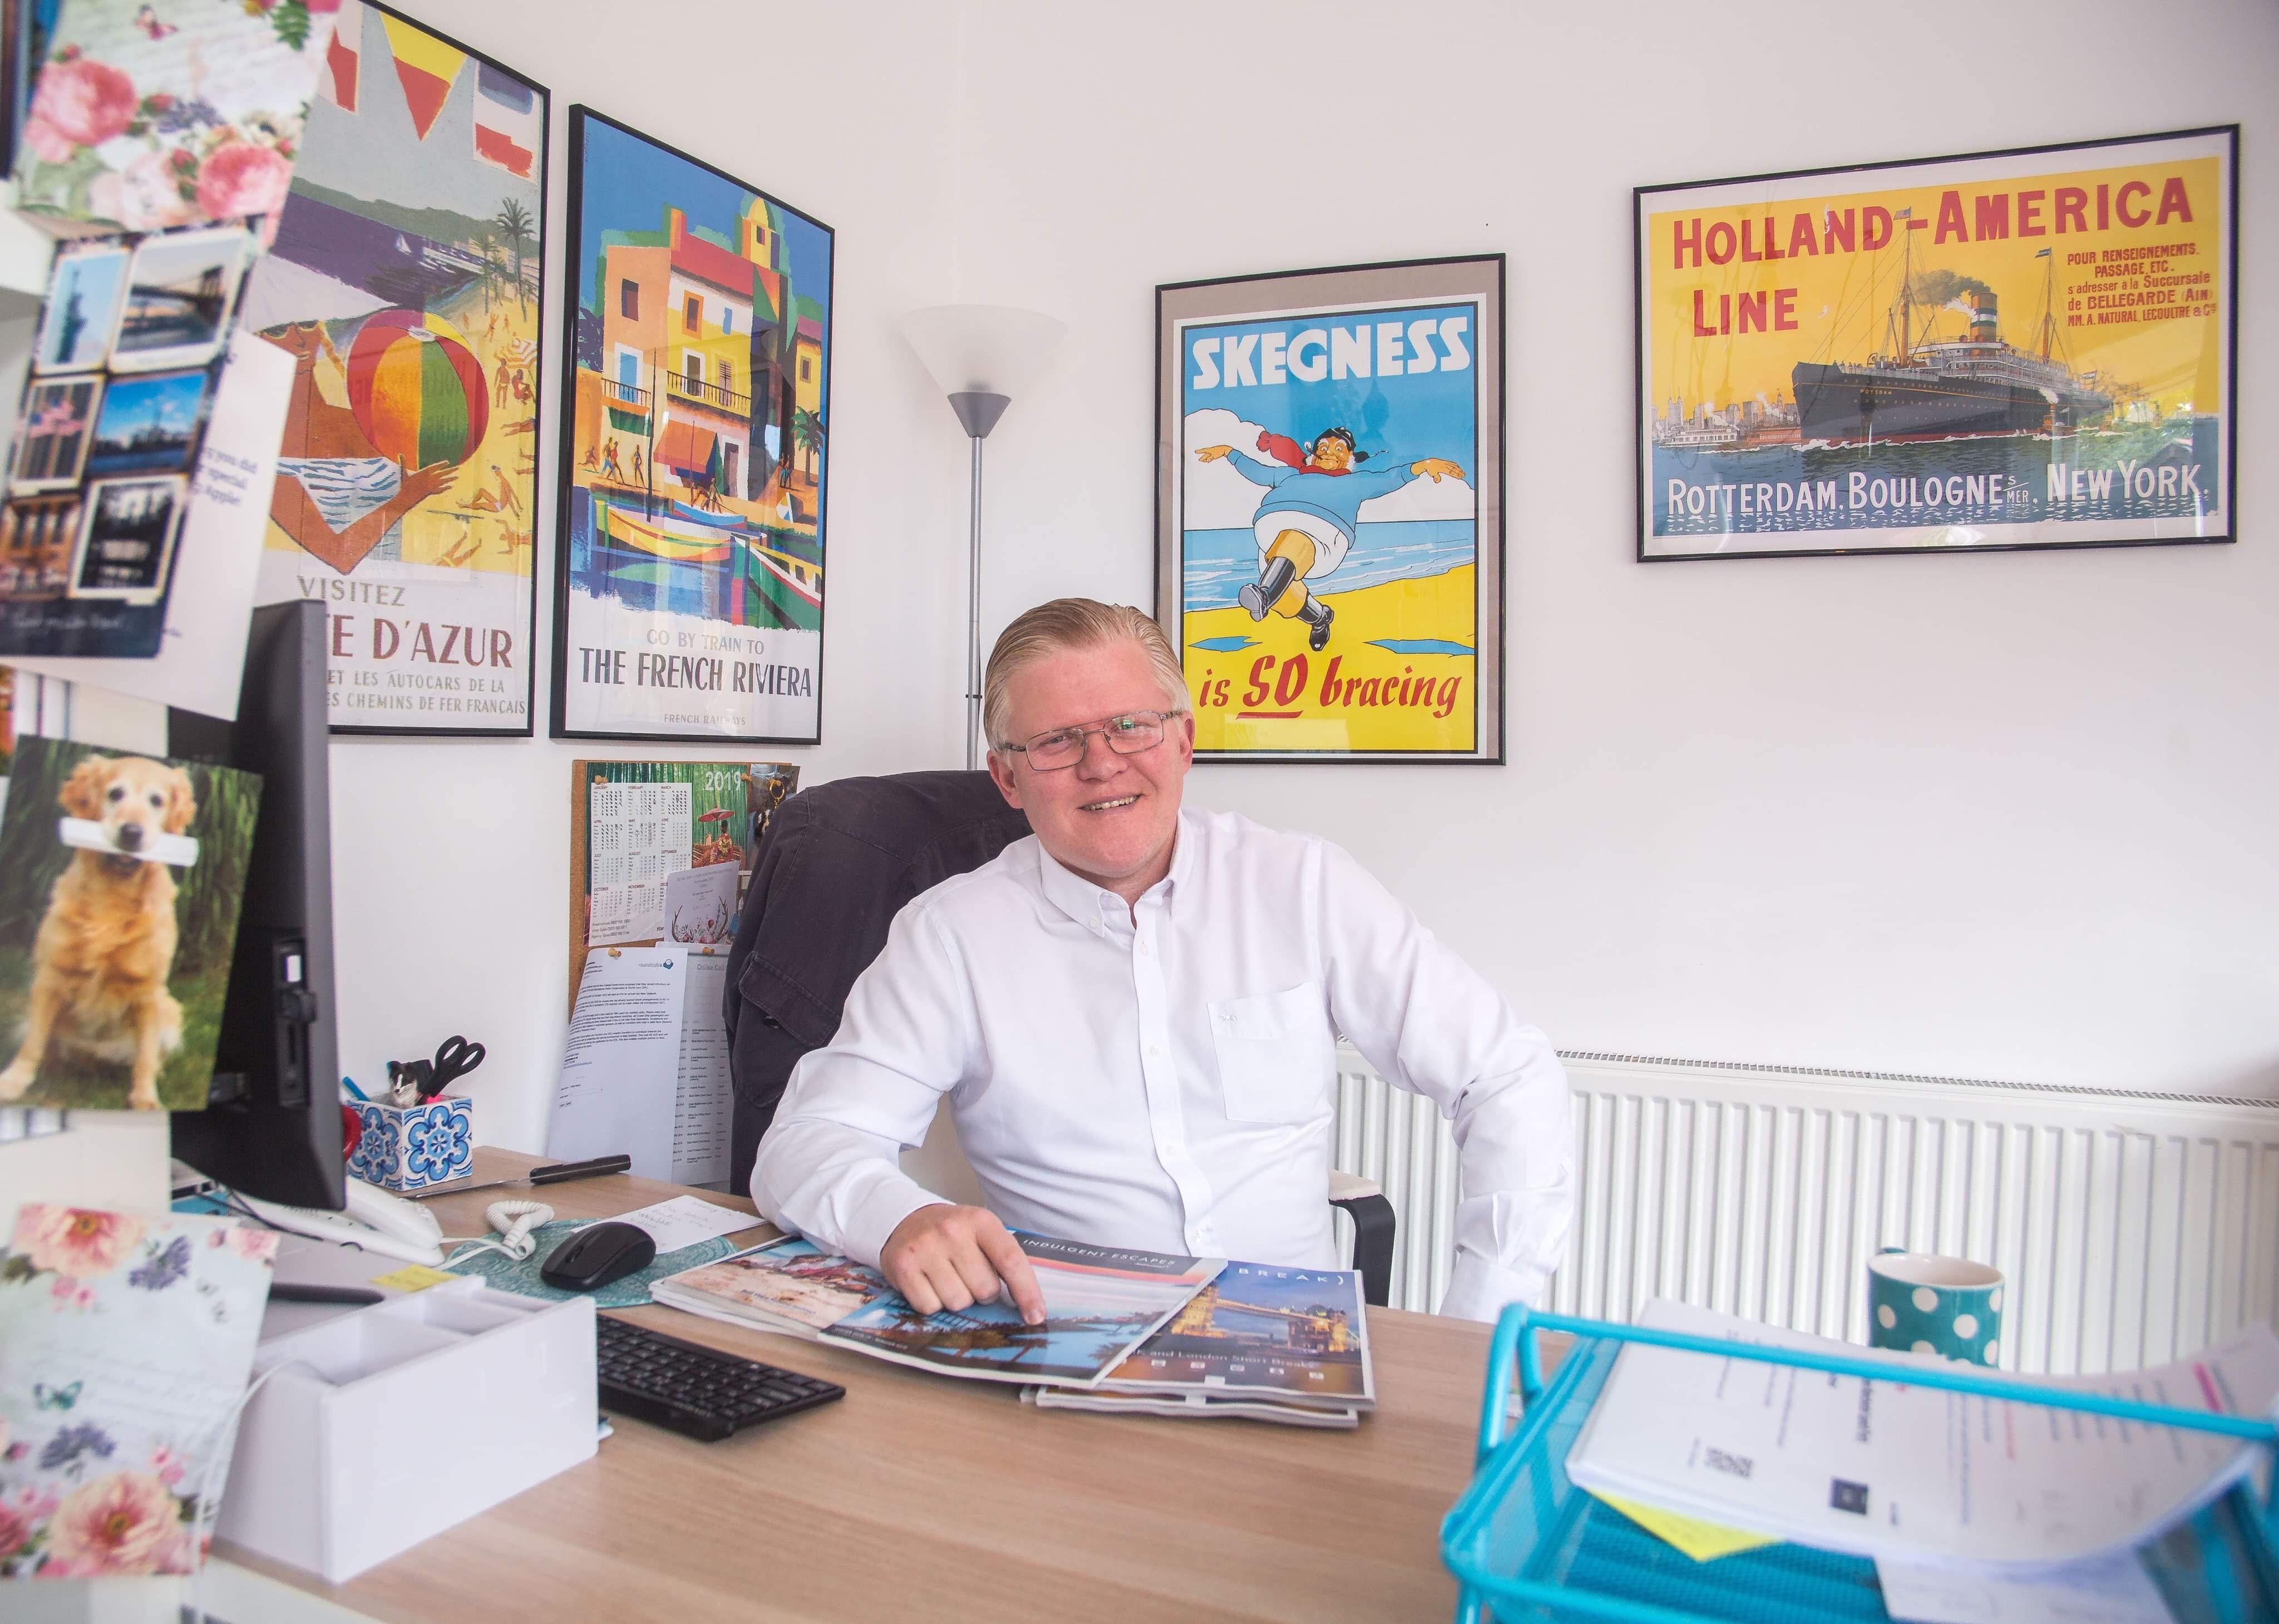 Andrew Freeman Llan Travel Family Fund